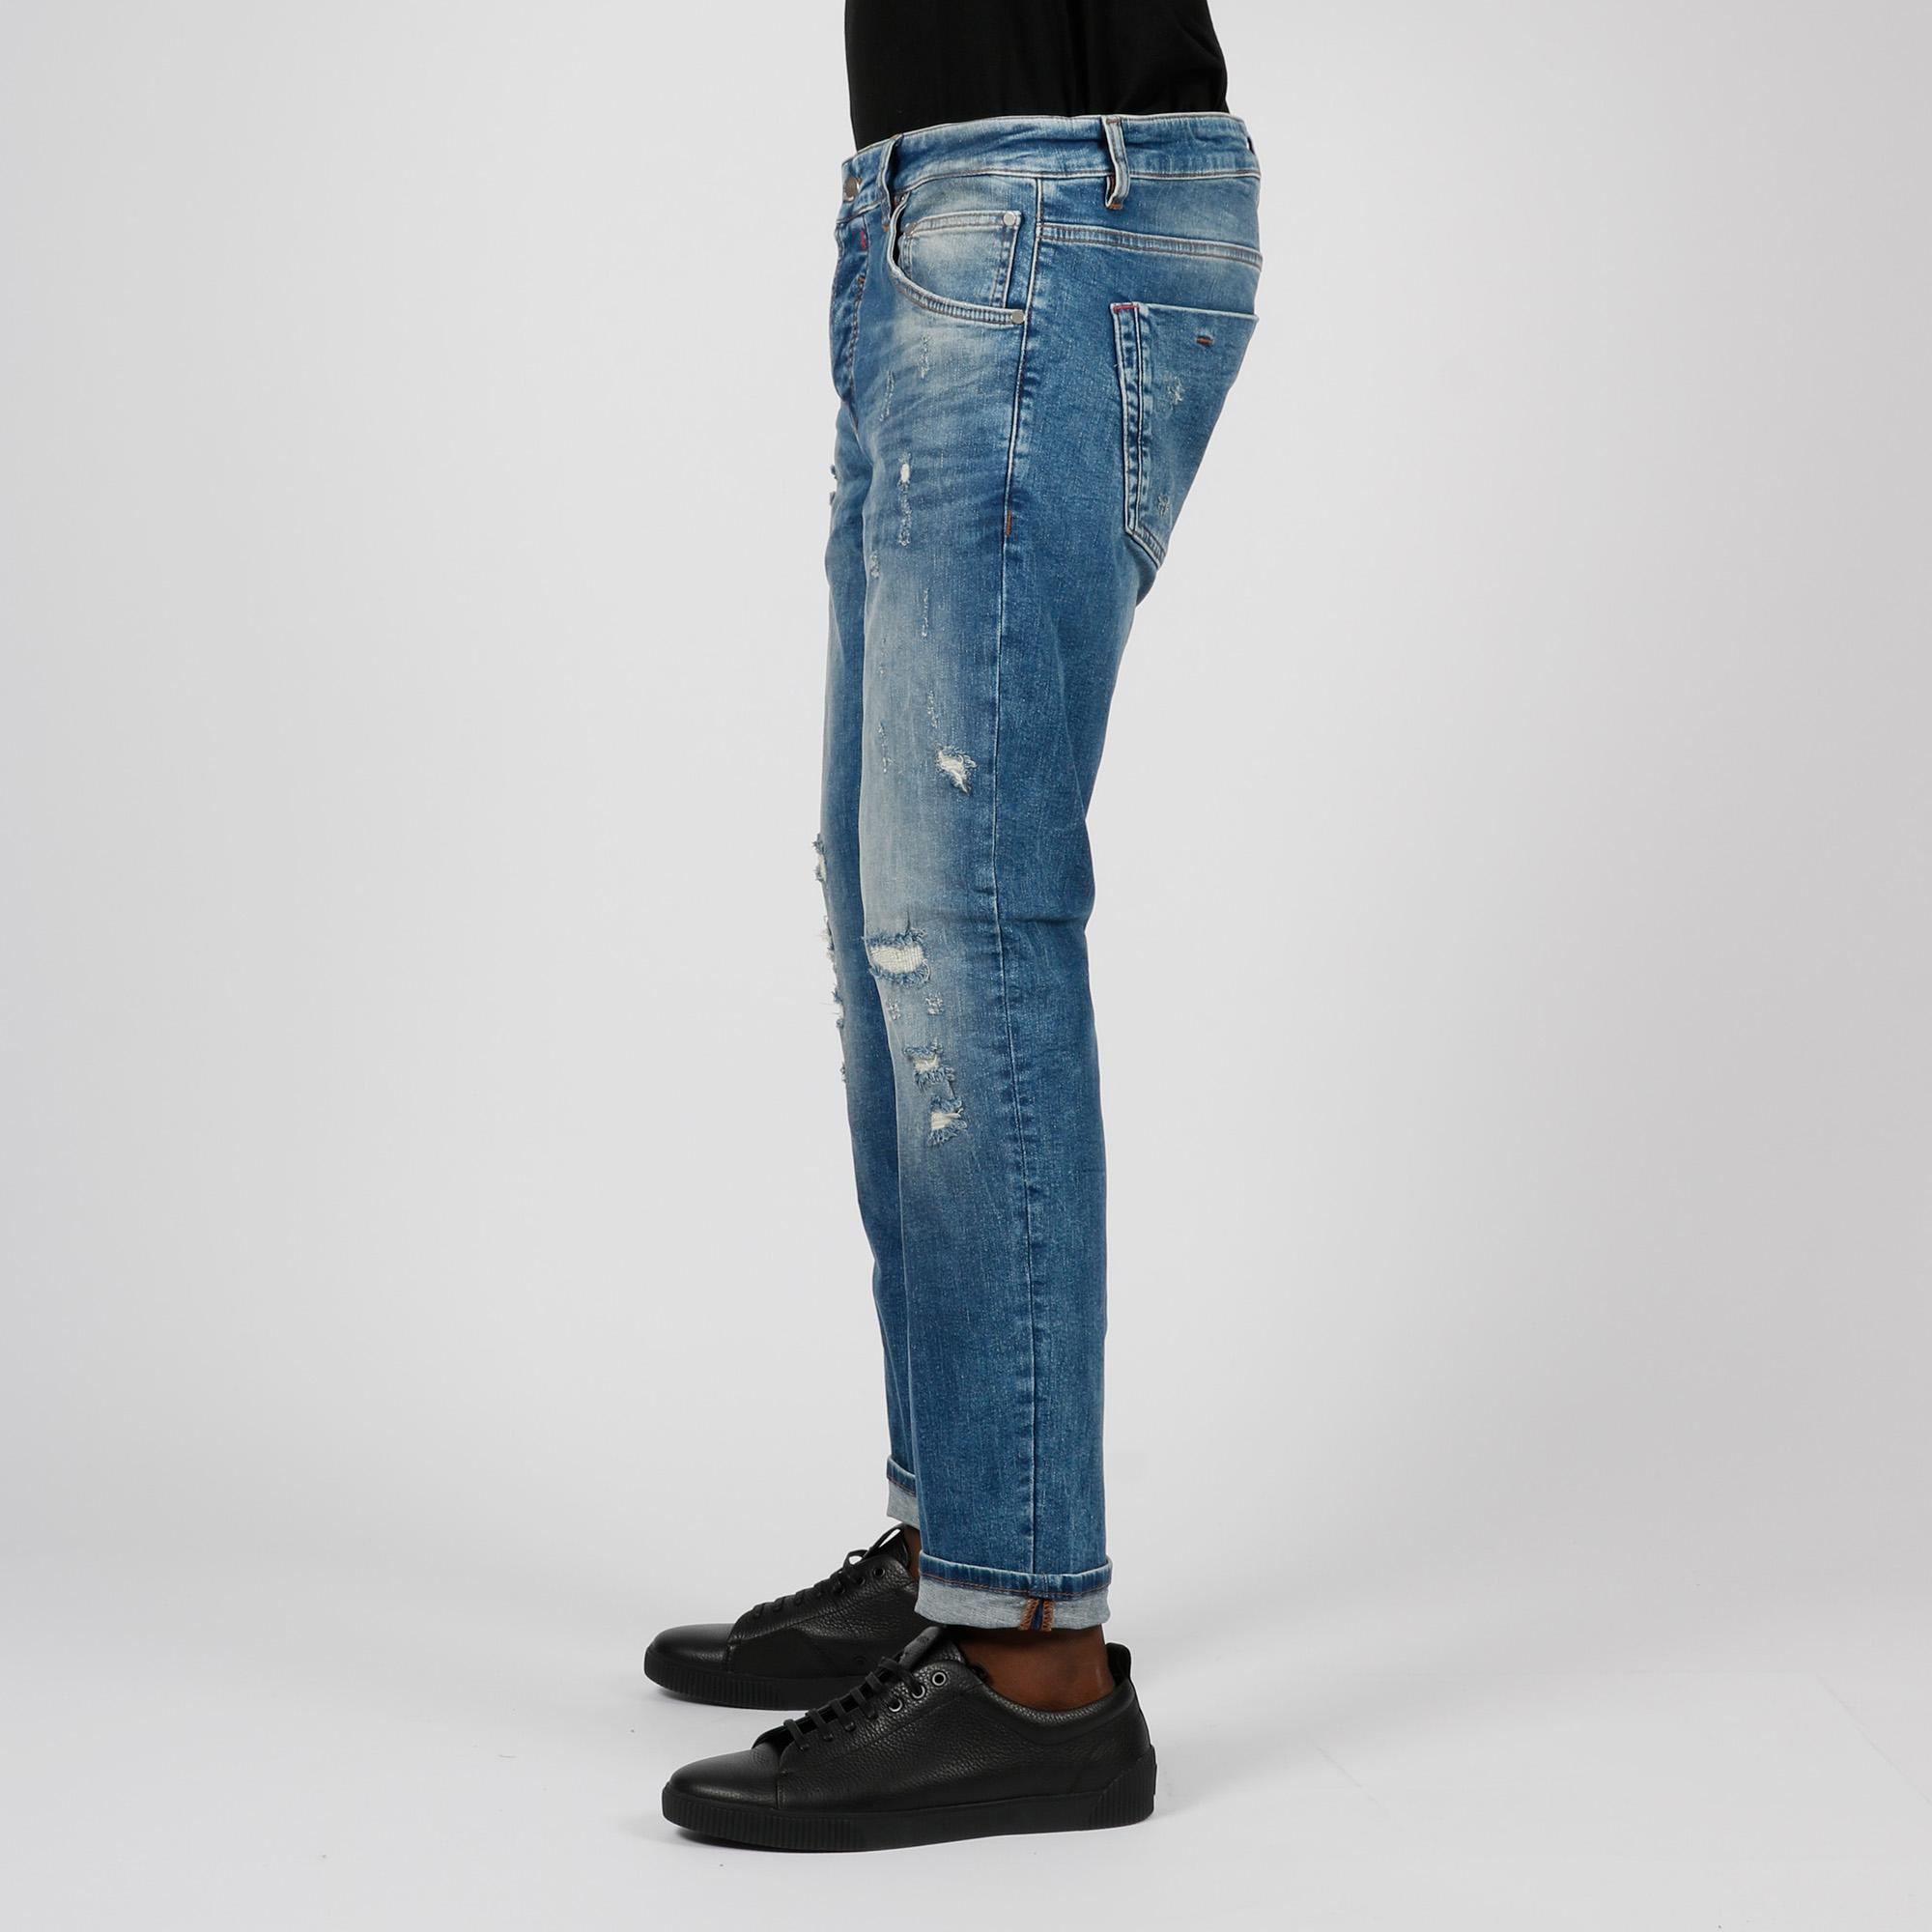 Jeans dandy - Denim